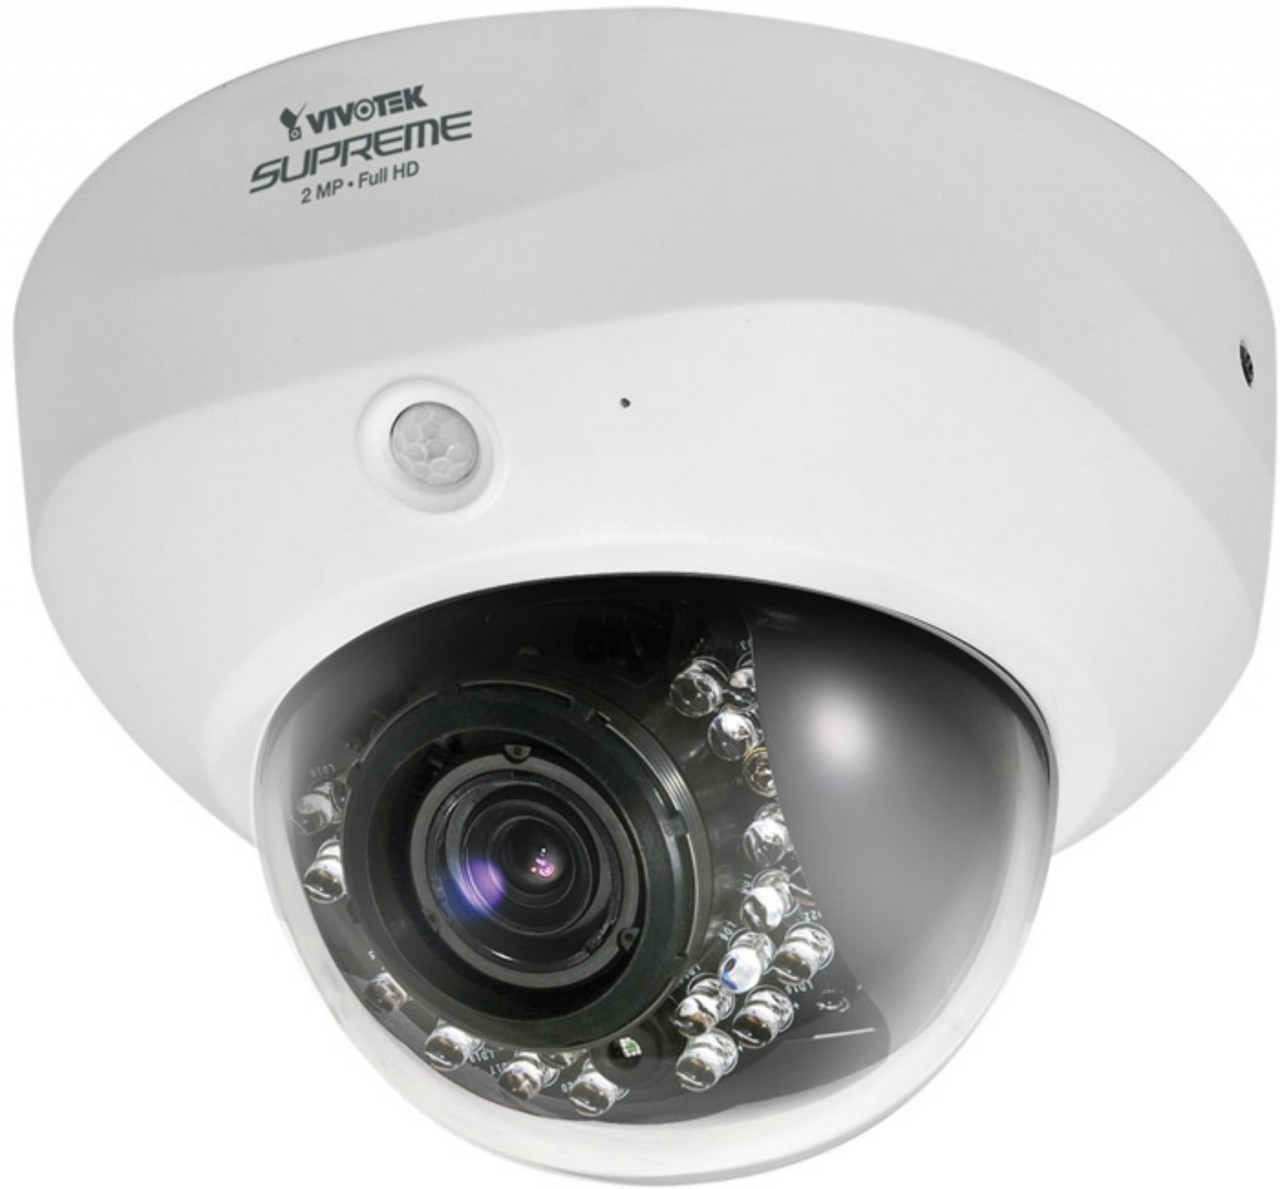 VIVOTEK FD8135H Network Camera X64 Driver Download